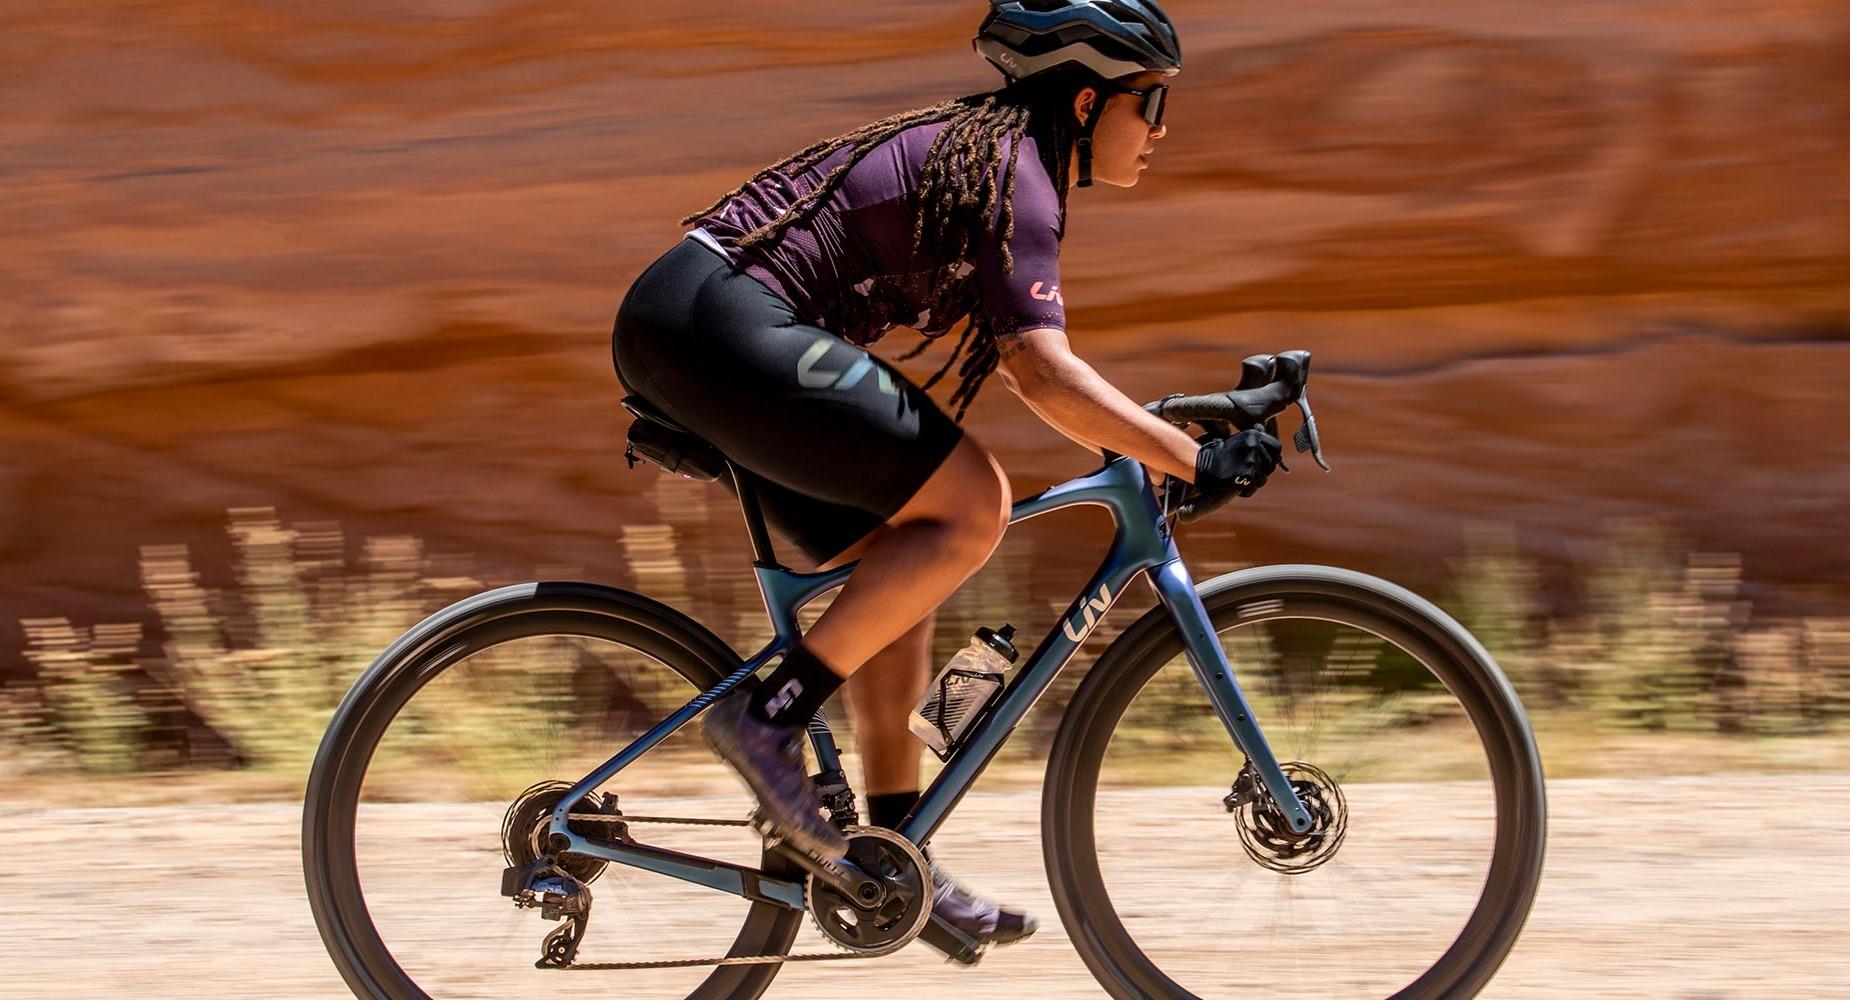 Rider on a road bike